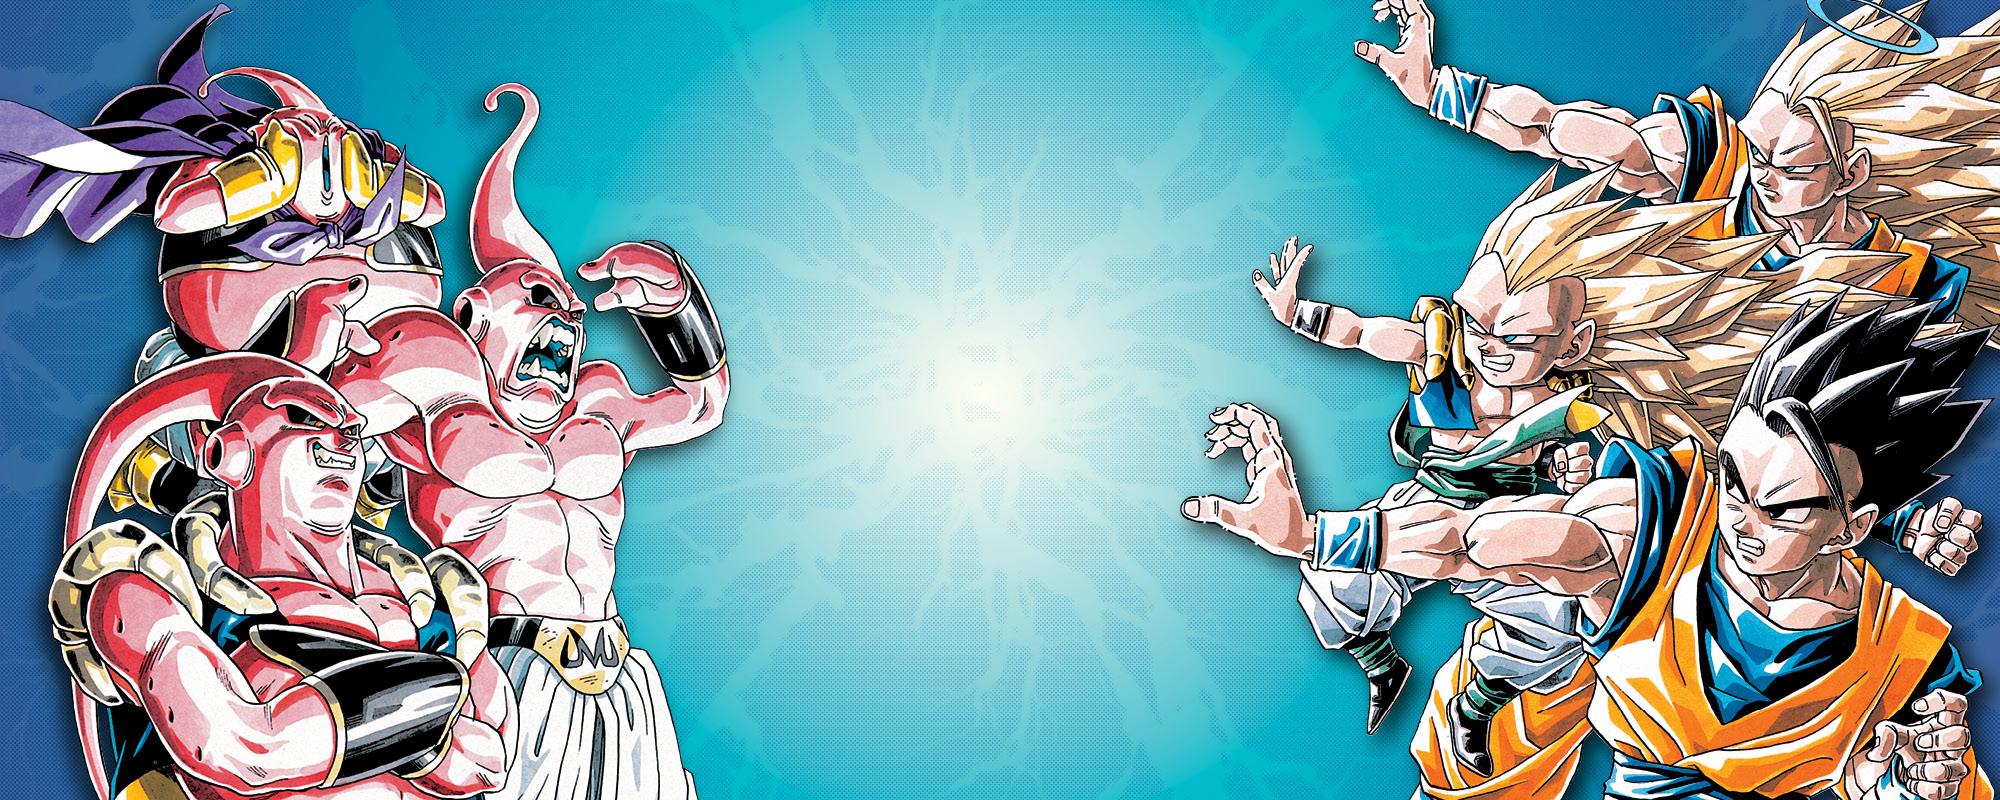 Viz Read Dragon Ball Z Manga Official Shonen Jump From Japan